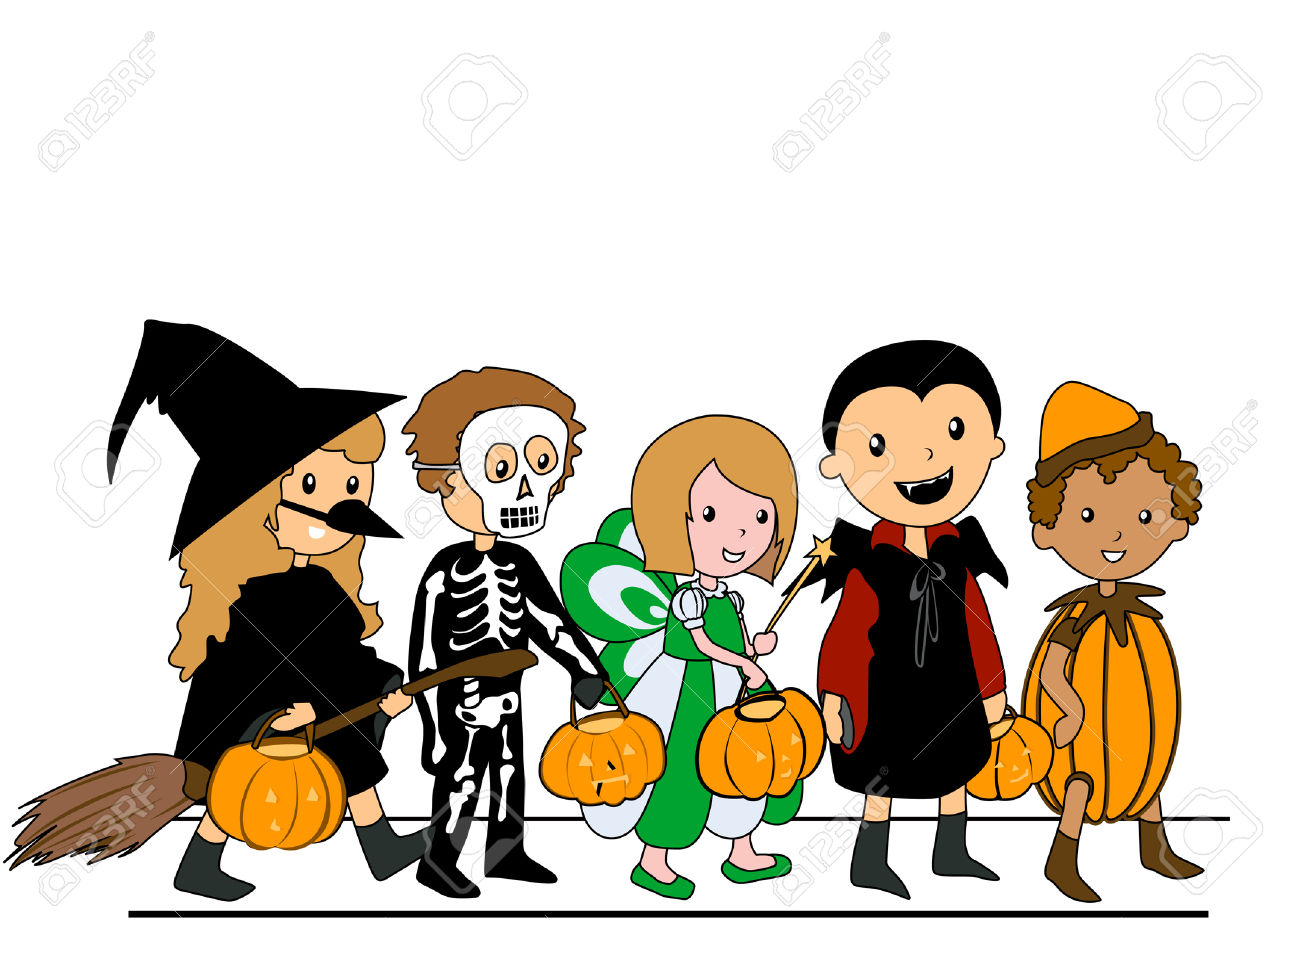 Halloween Costume Clipart ... Kids Walki-Halloween Costume Clipart ... kids walking in halloween .-10